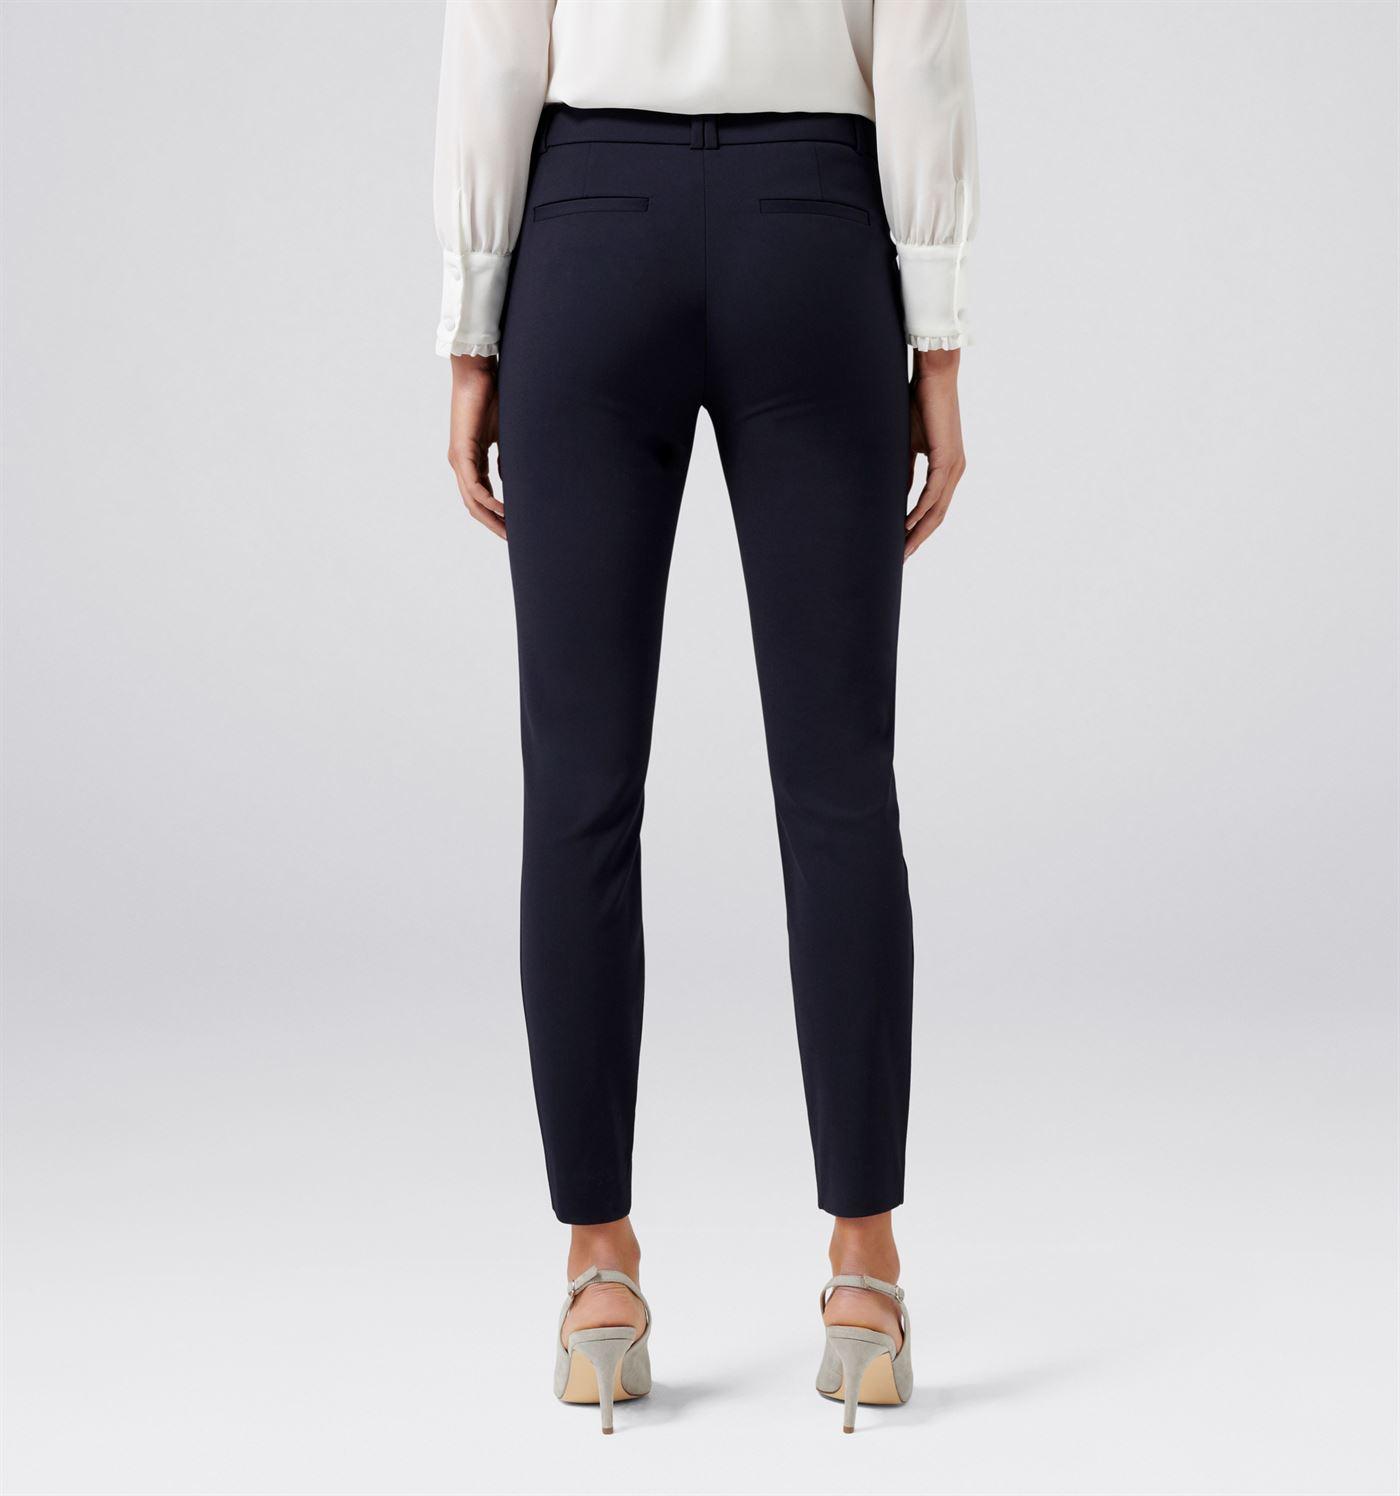 Forever New Women Casual Wear Navy Blue Trouser